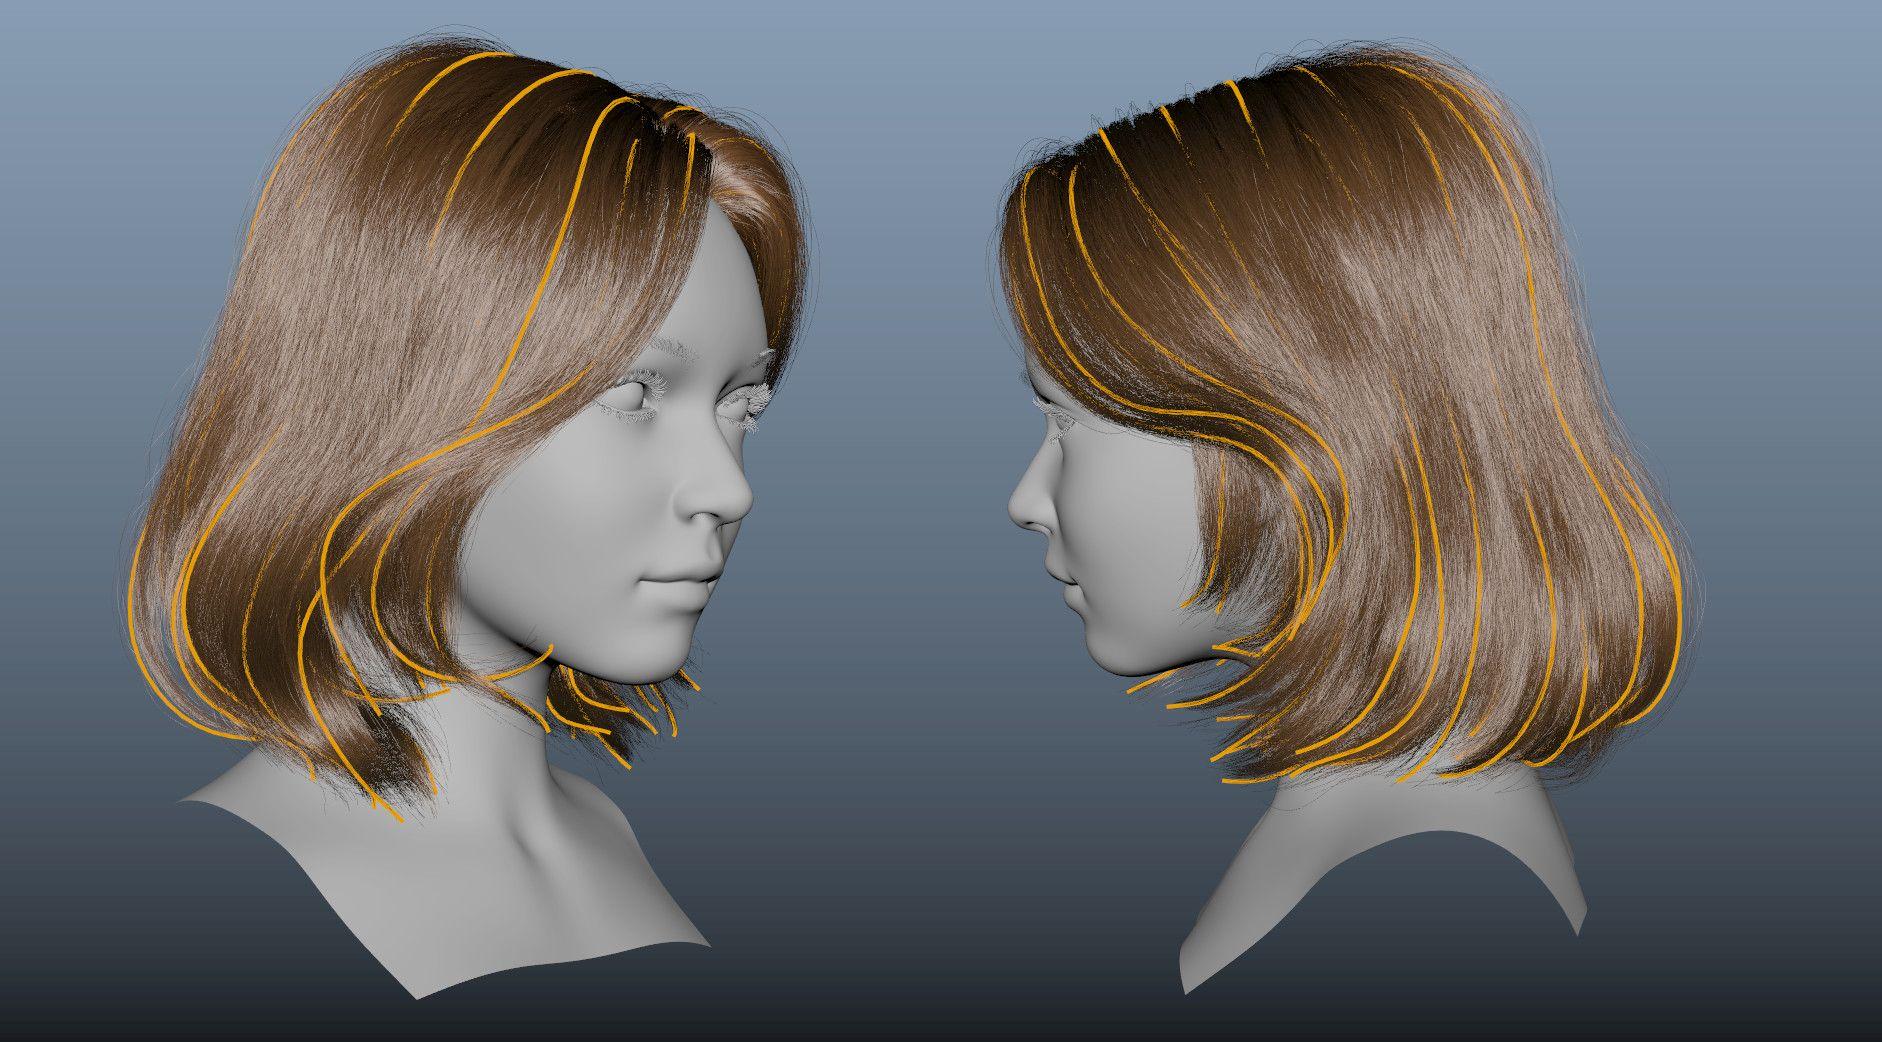 ArtStation - Realistic Hair XGen in Arnold, Box Shih | CG